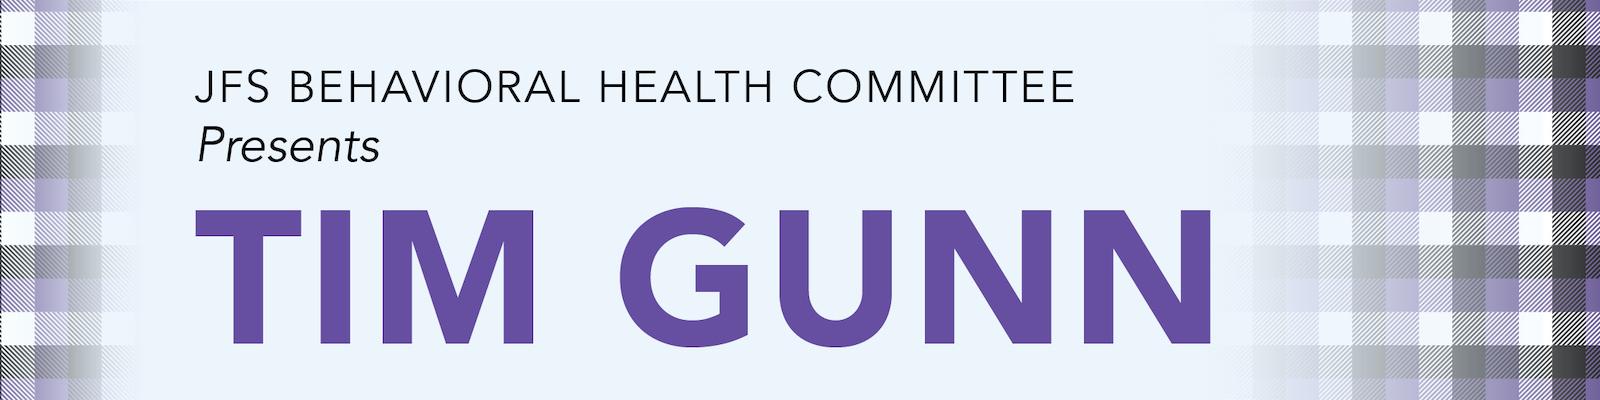 banner for Behavioral Health Committee presents Tim Gunn